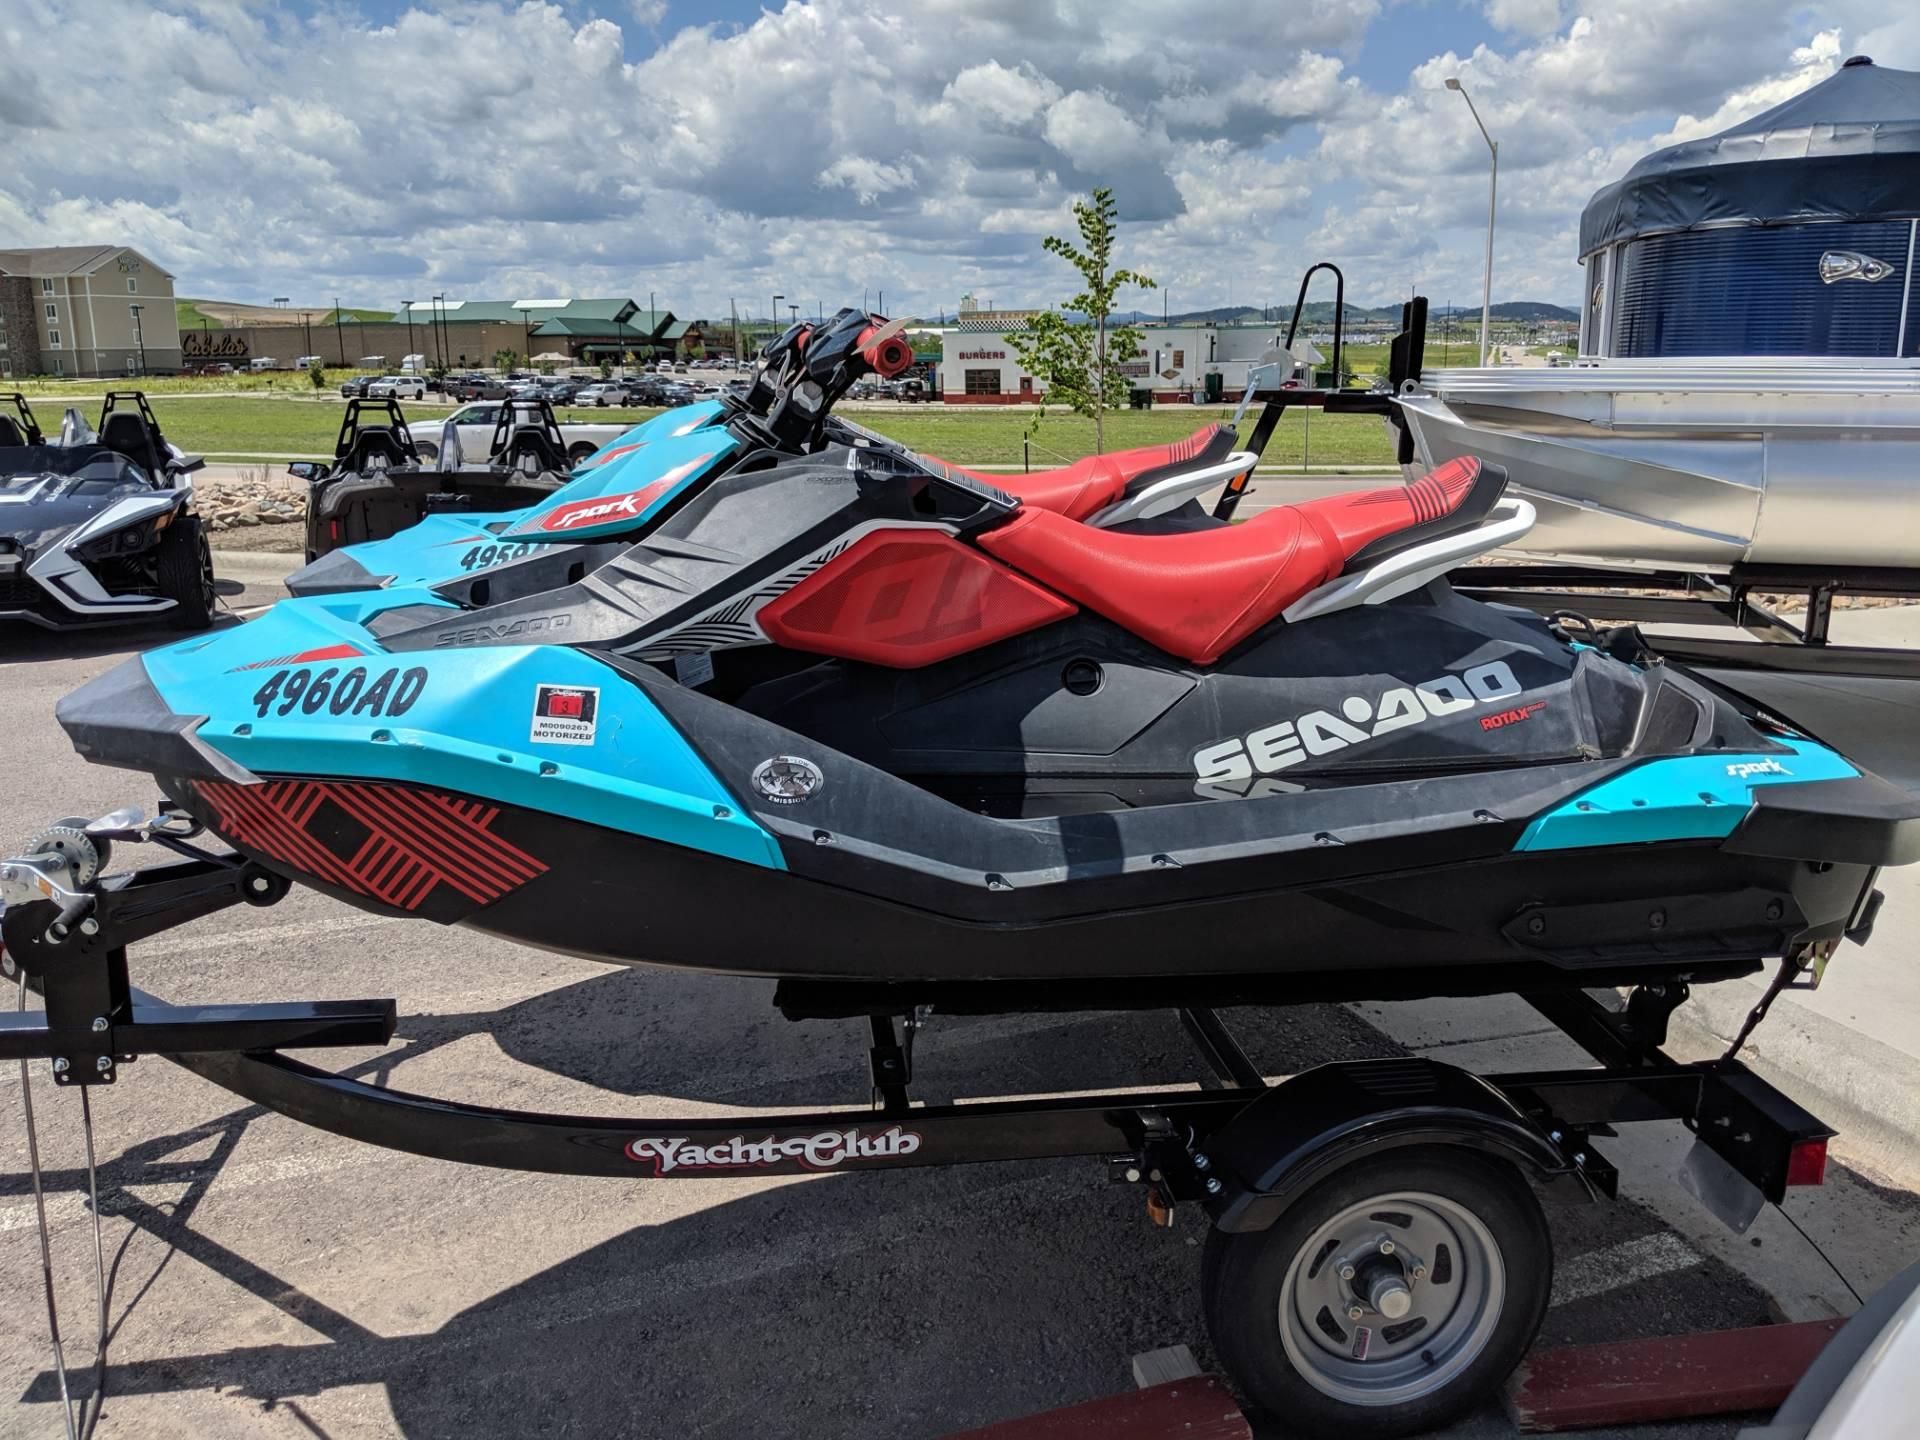 2017 Sea-Doo Spark 2up Trixx iBR for sale 153356